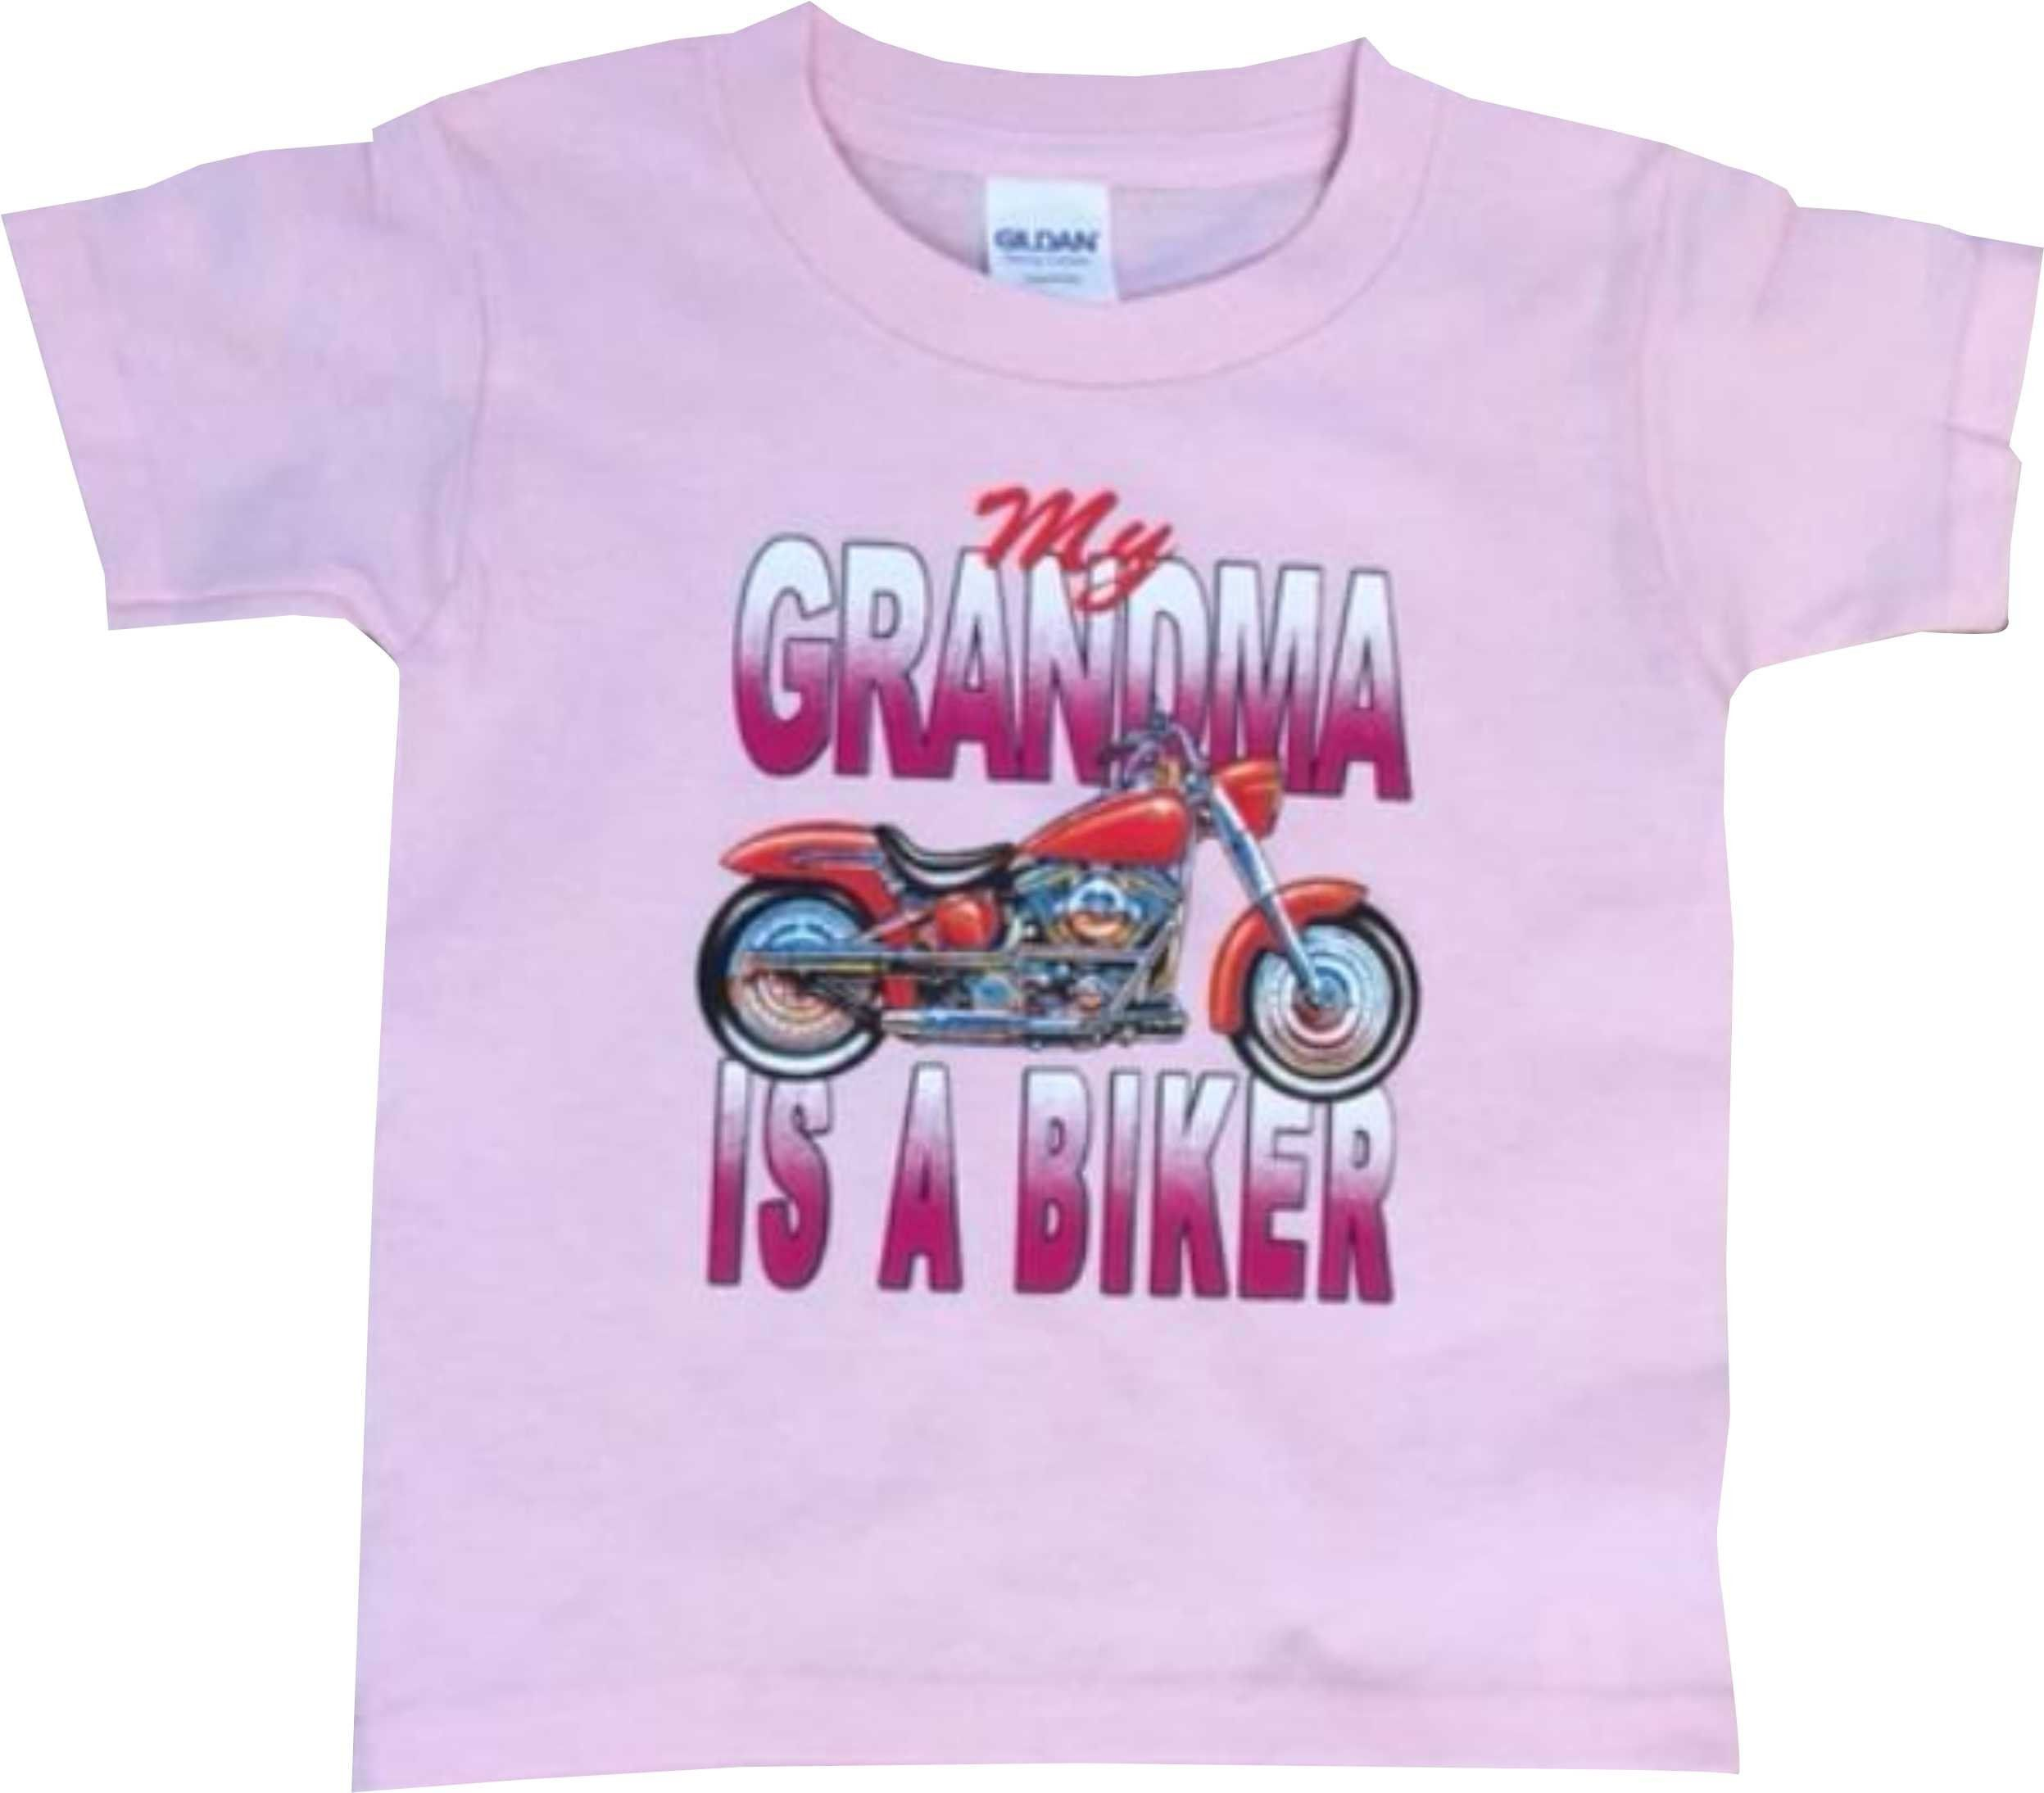 Biker Choice Motorcycle HEAT PRESS TRANSFER PRINT for T Shirt Sweatshirt #043